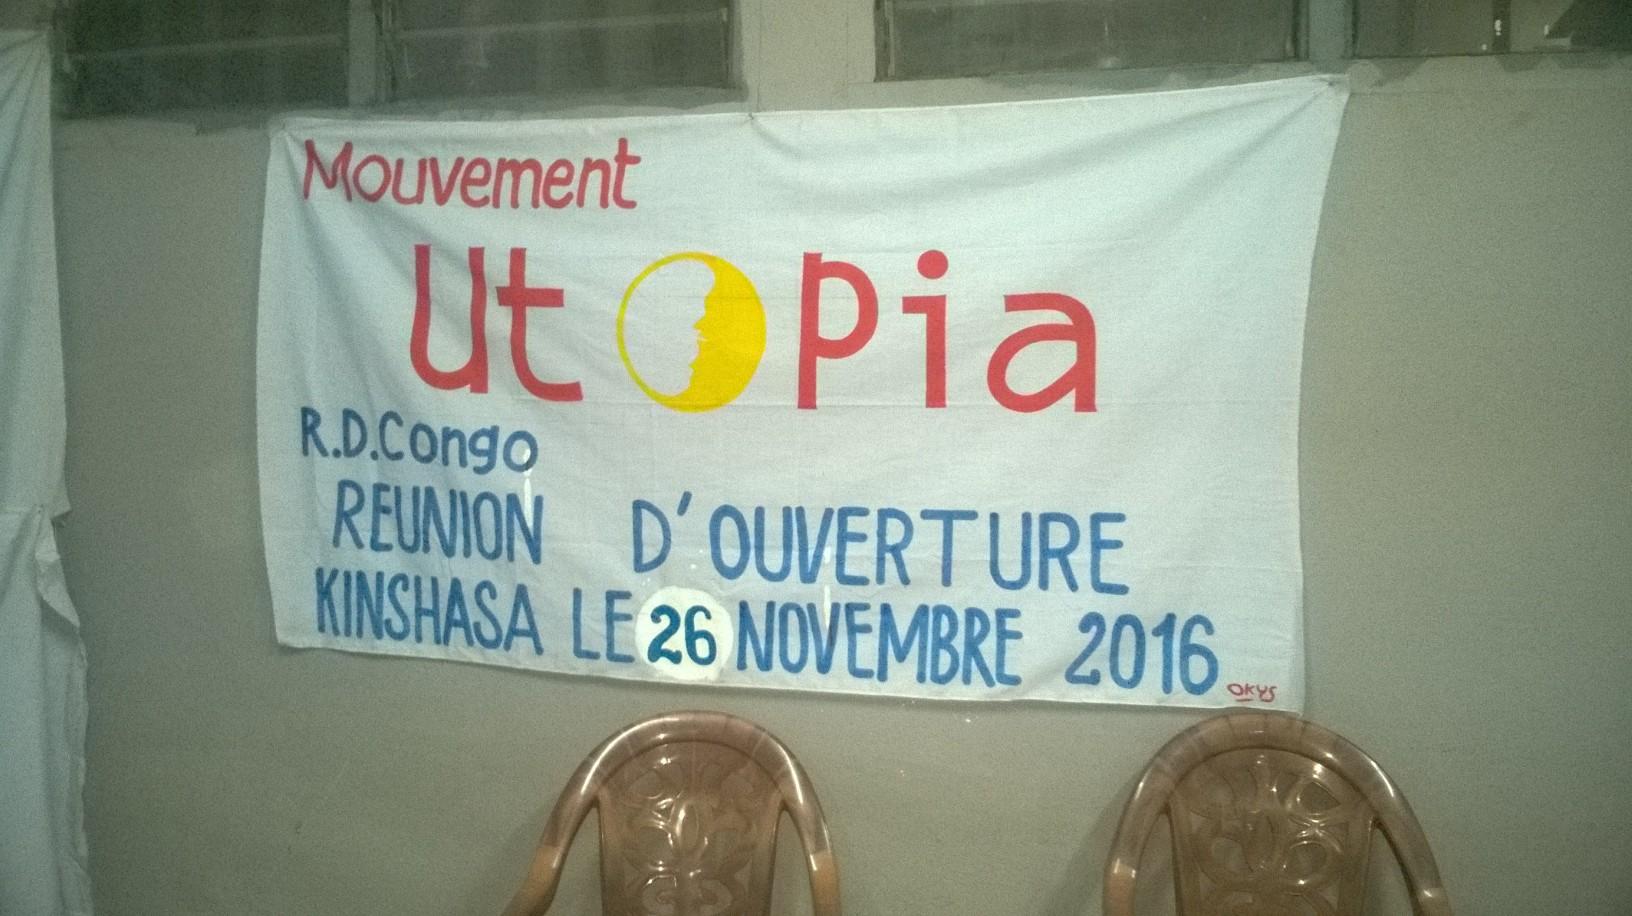 reunion-lancement-utopia-rdc